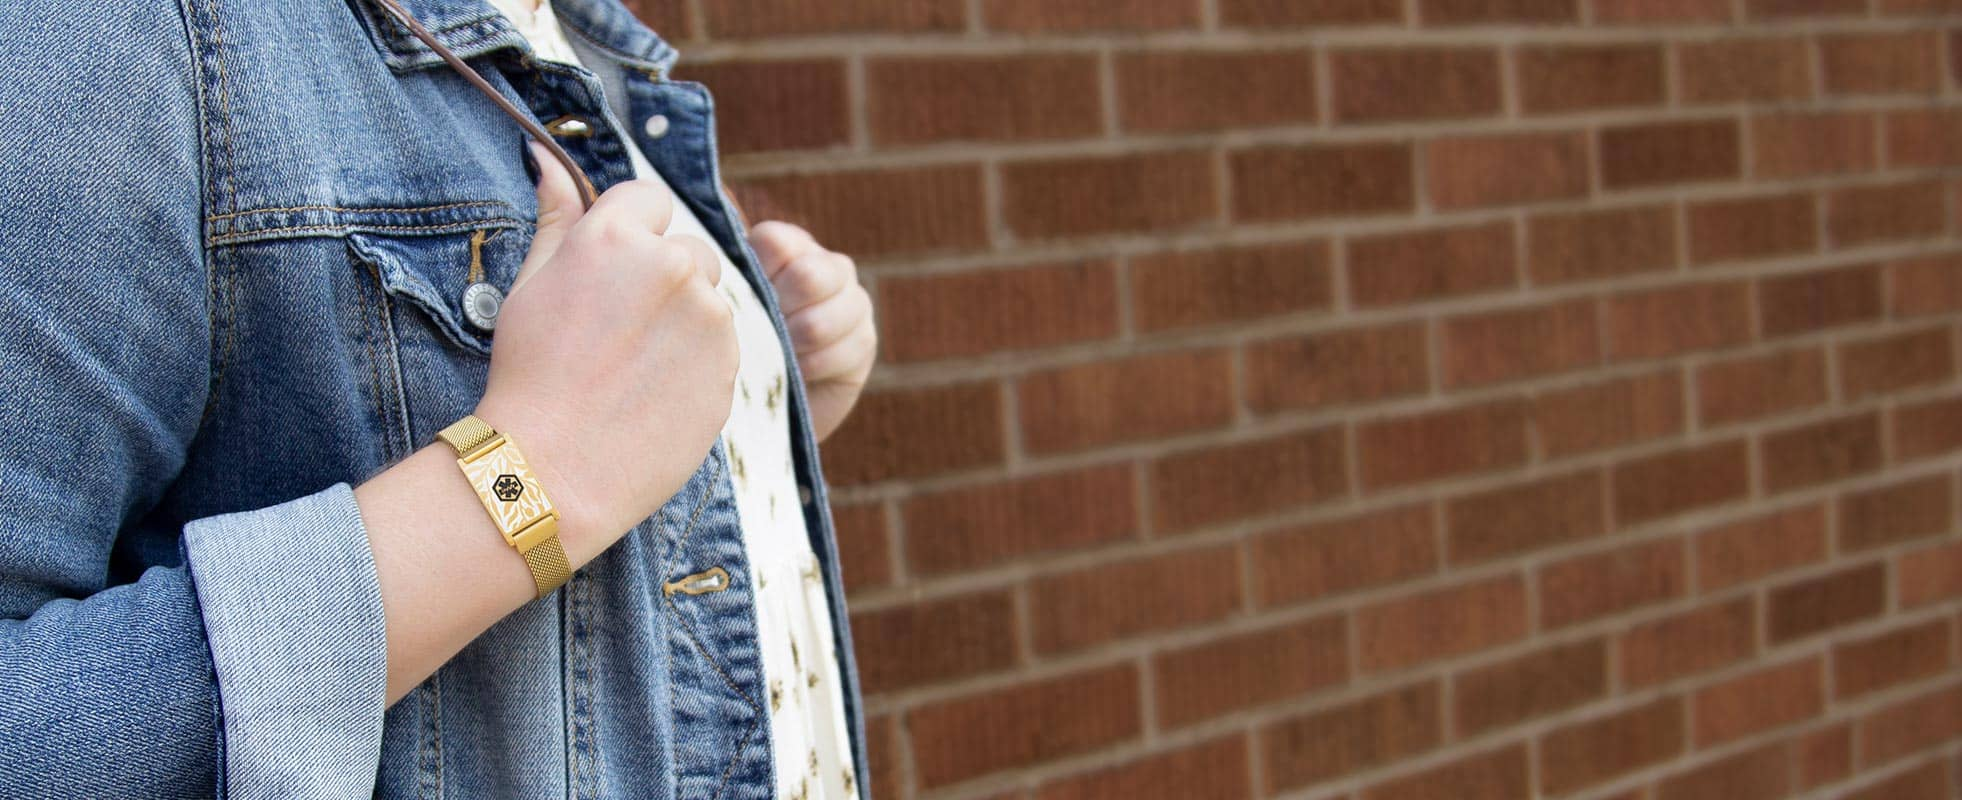 Woman wearing denim jacket and gold tone medical alert bracelet